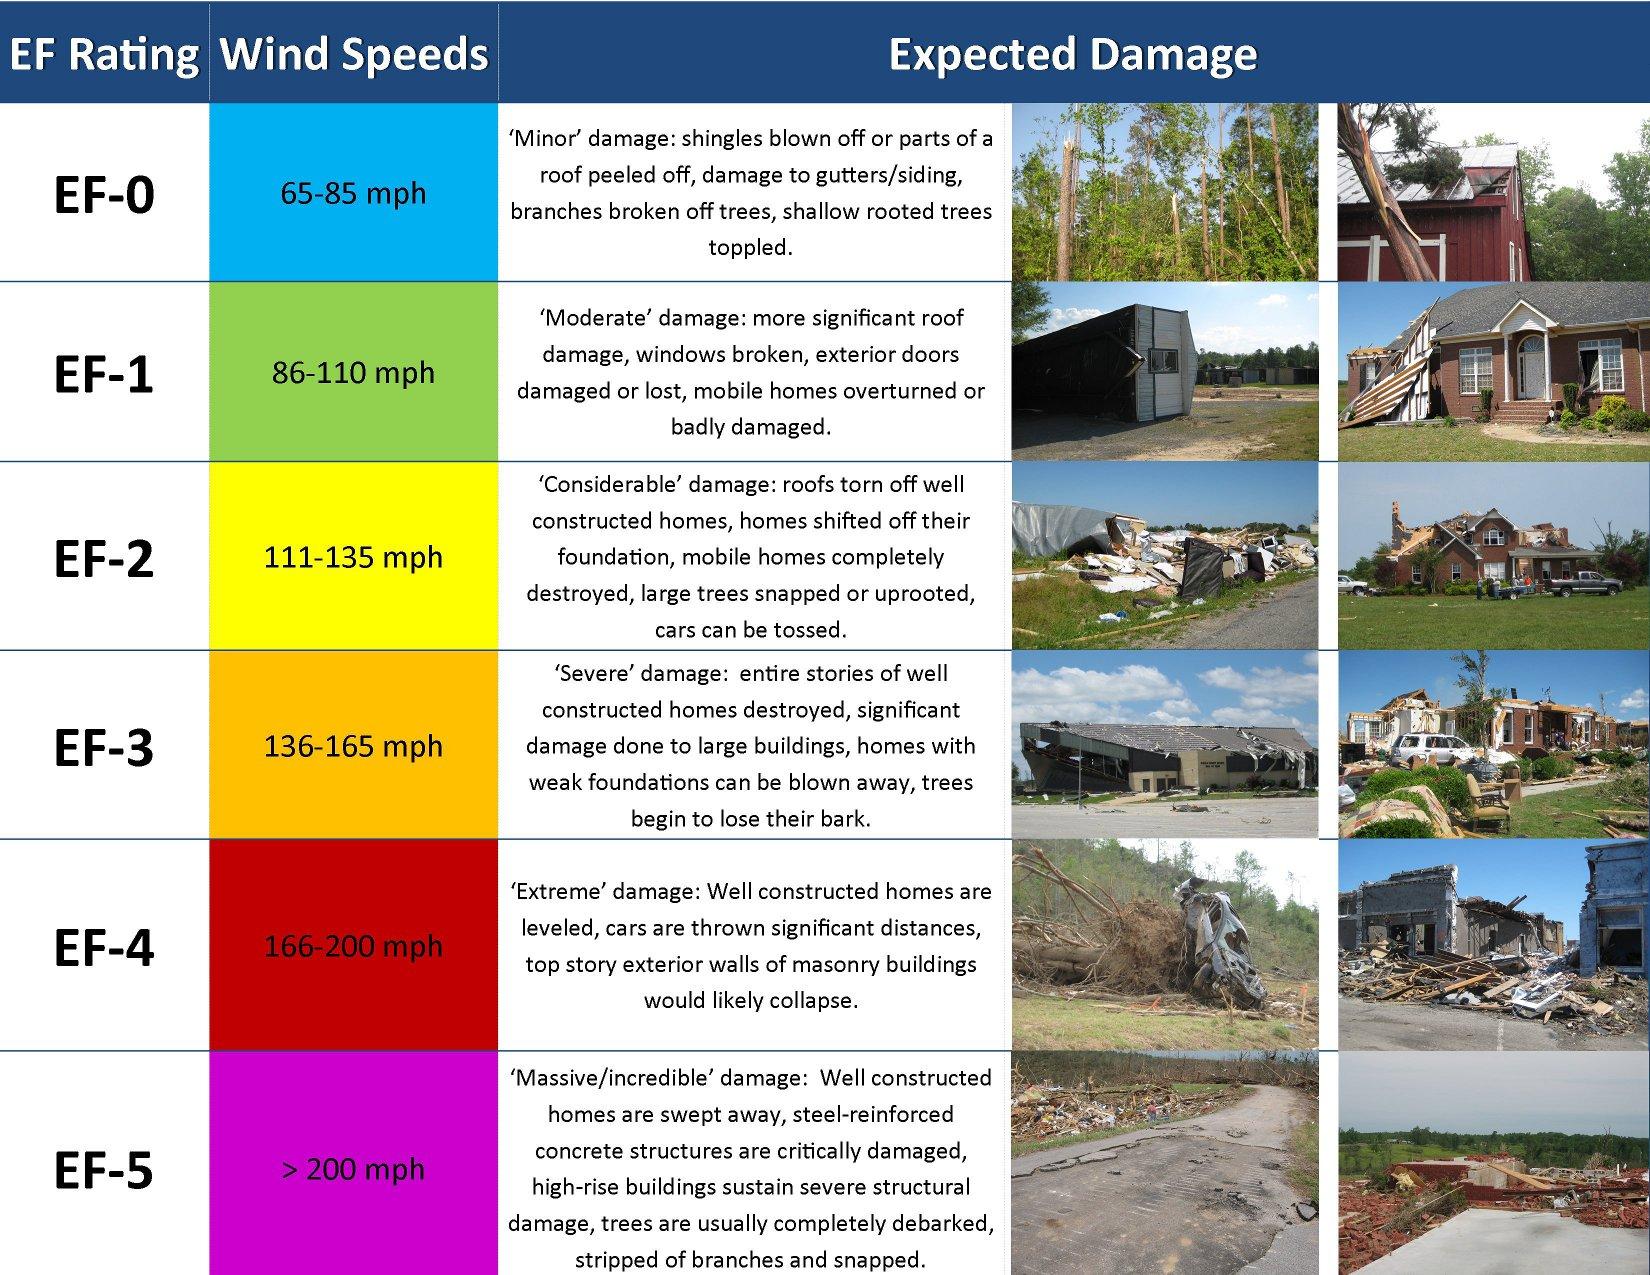 Tornado damage ratings via NOAA